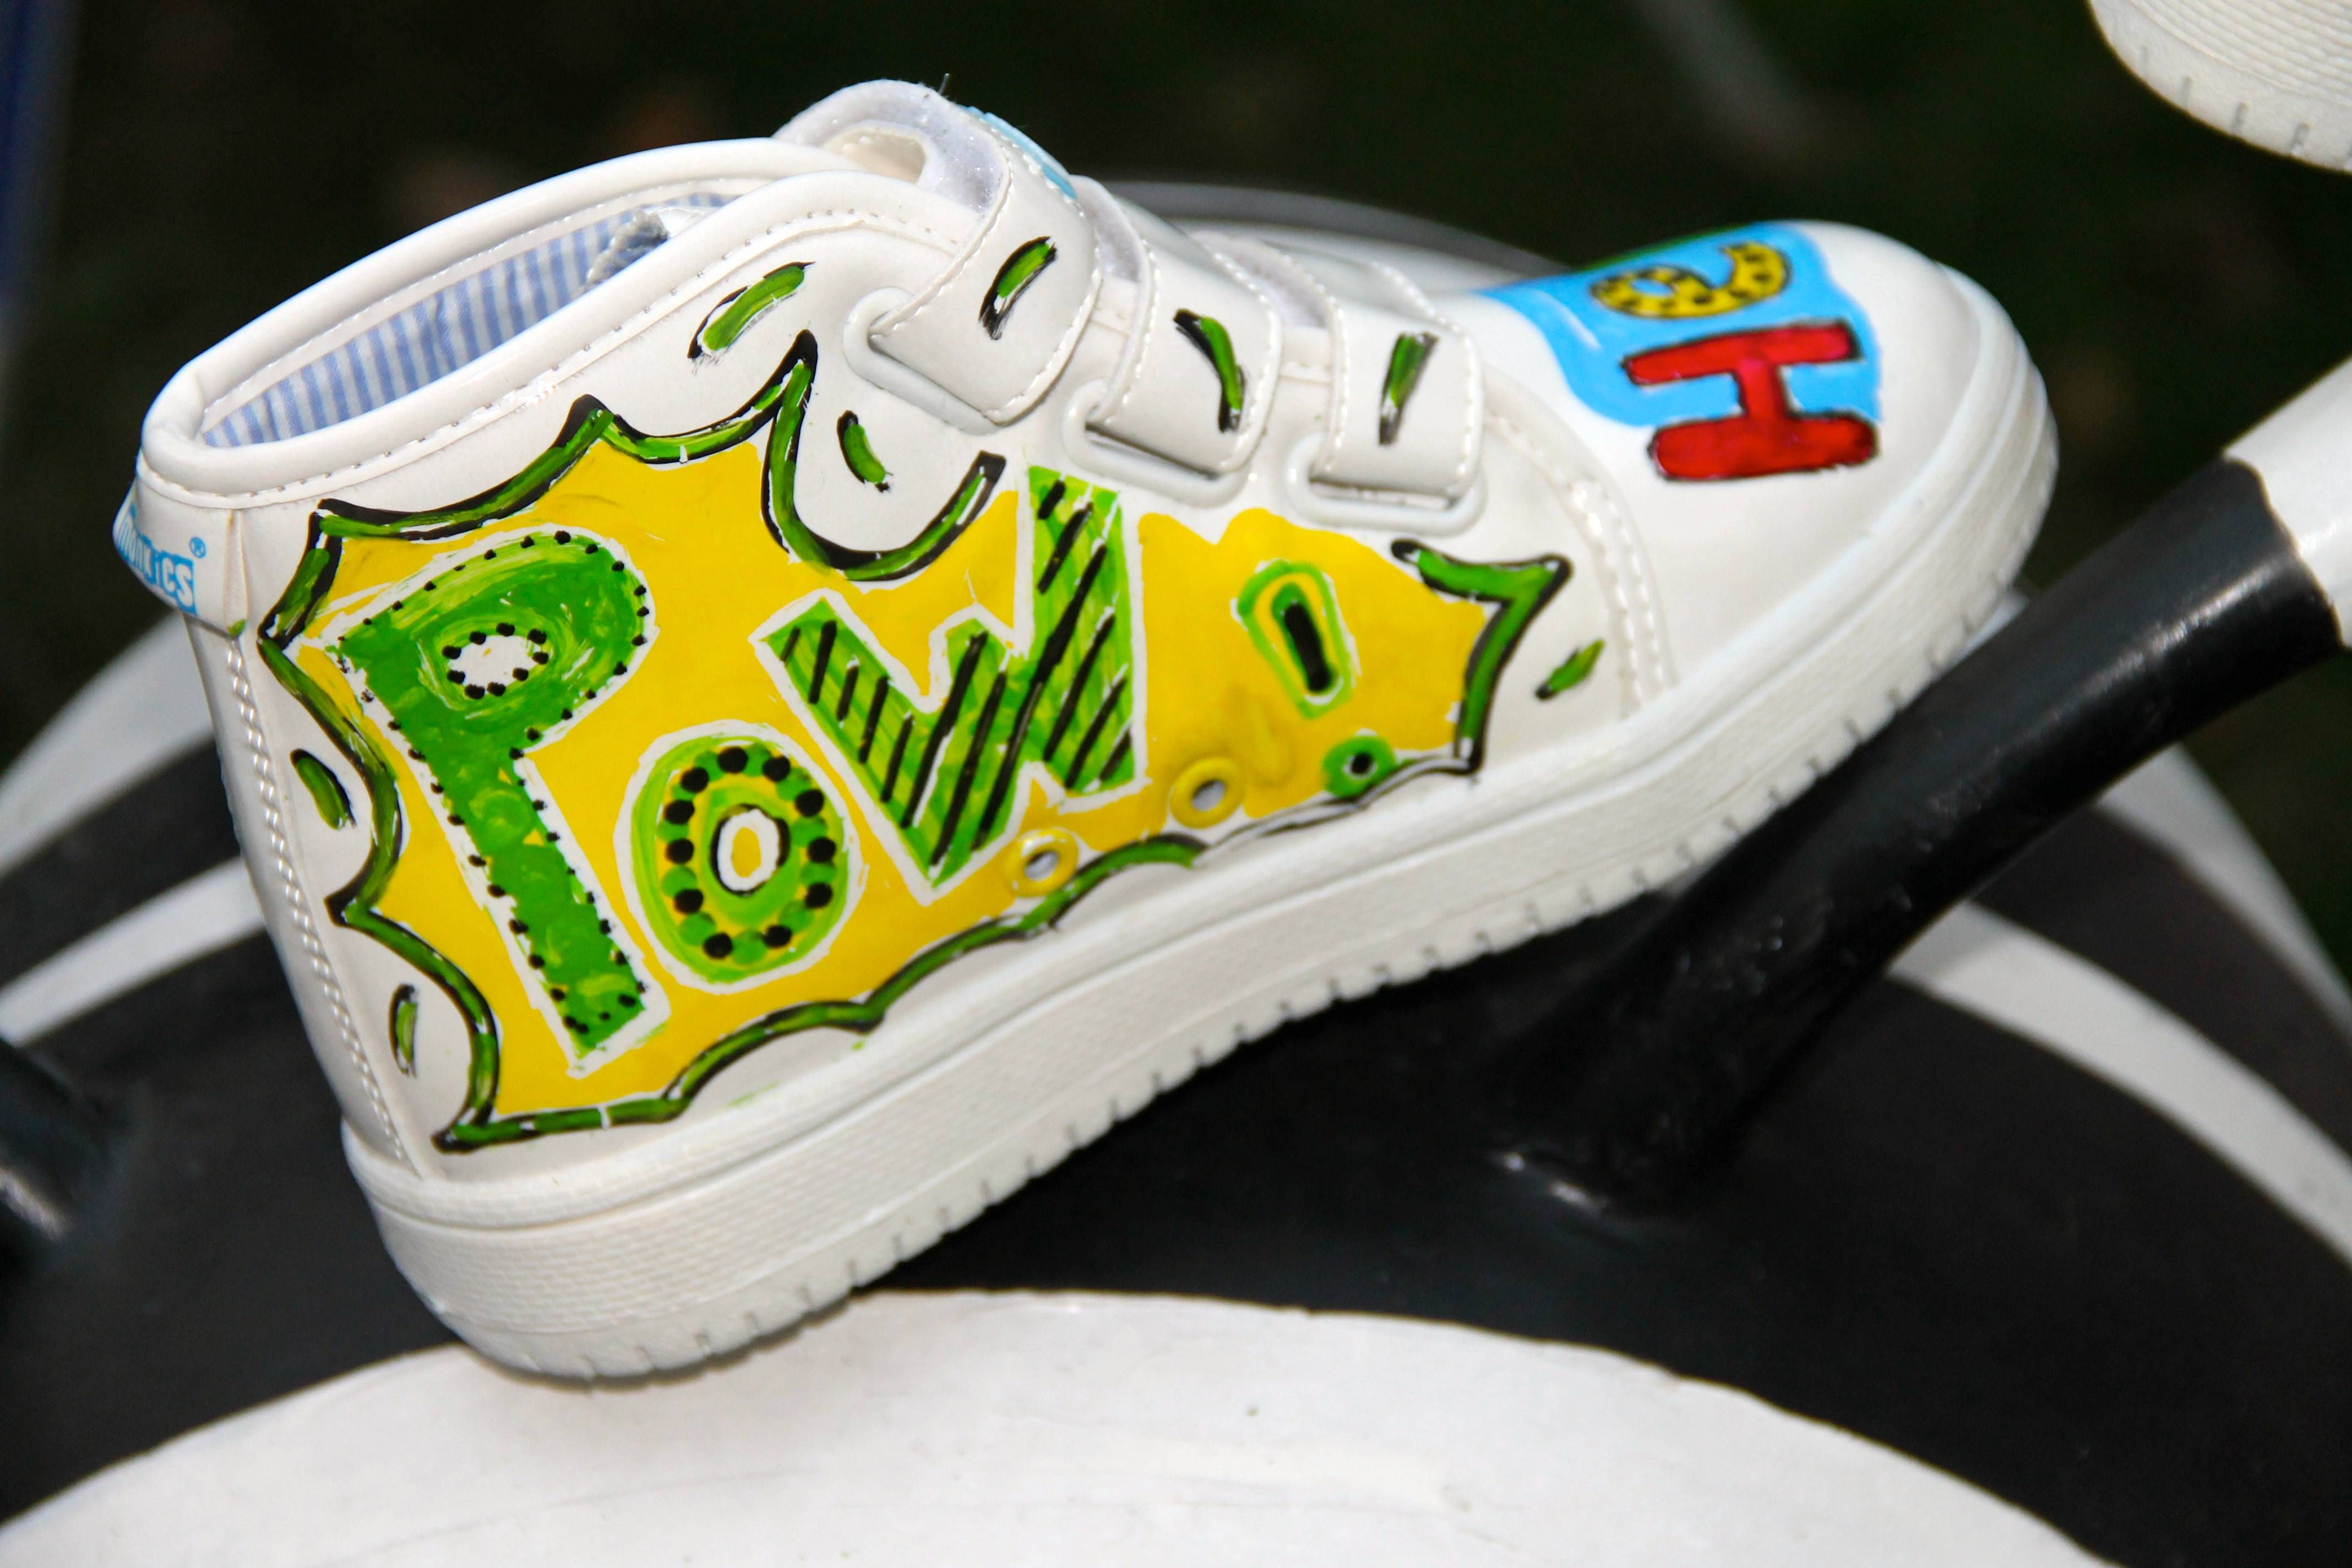 Pow !  Monkies shoes the best #kids #present for #Christmas #shoes #kids #draw #color #erase #fashion www.monkies-shoes.com